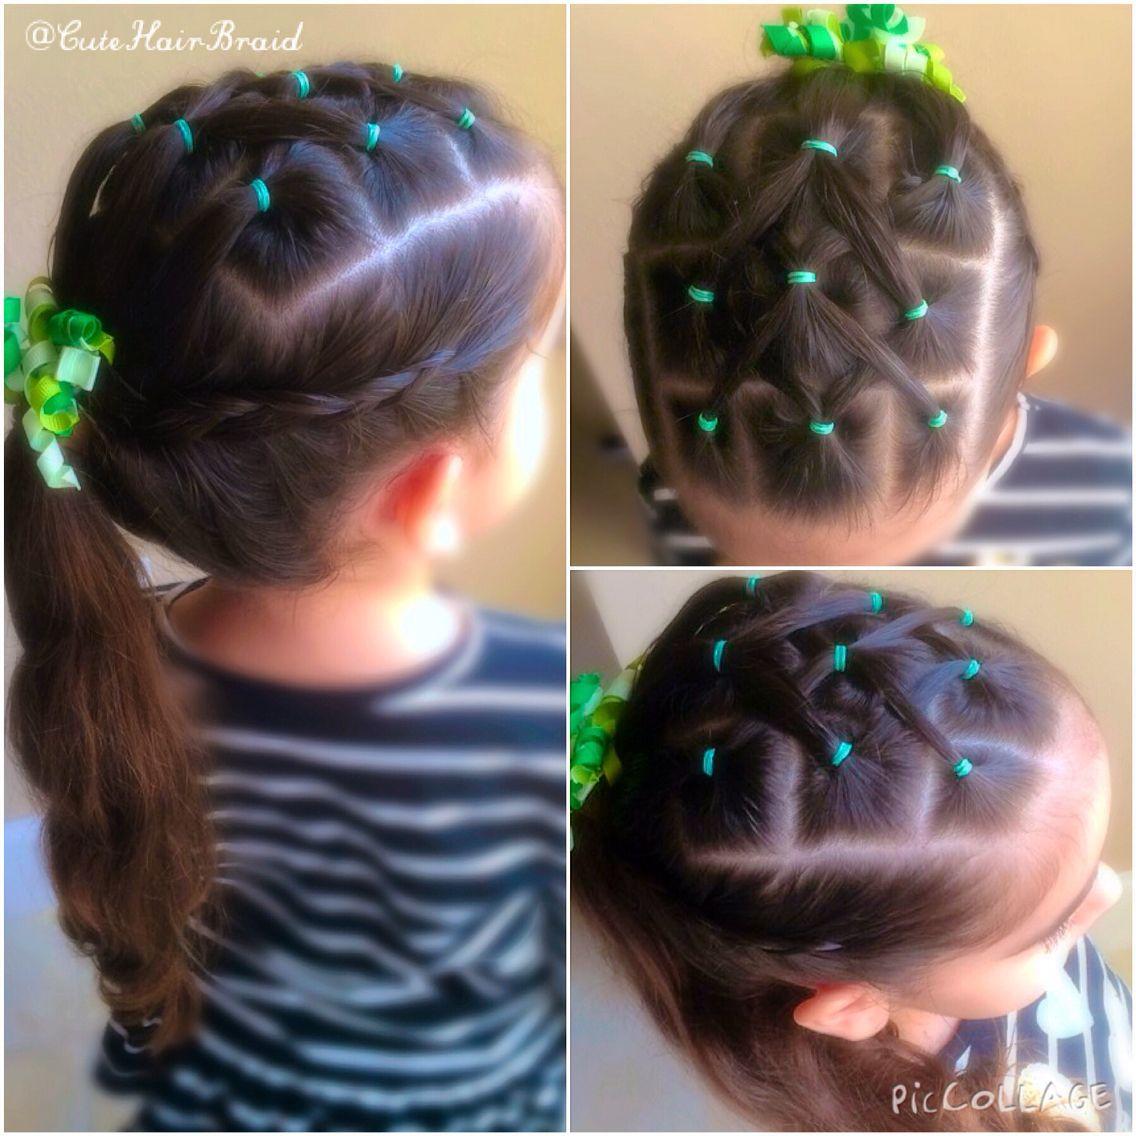 Pretty hair style for girls lindo peinados para ni as - Peinados de ninas ...